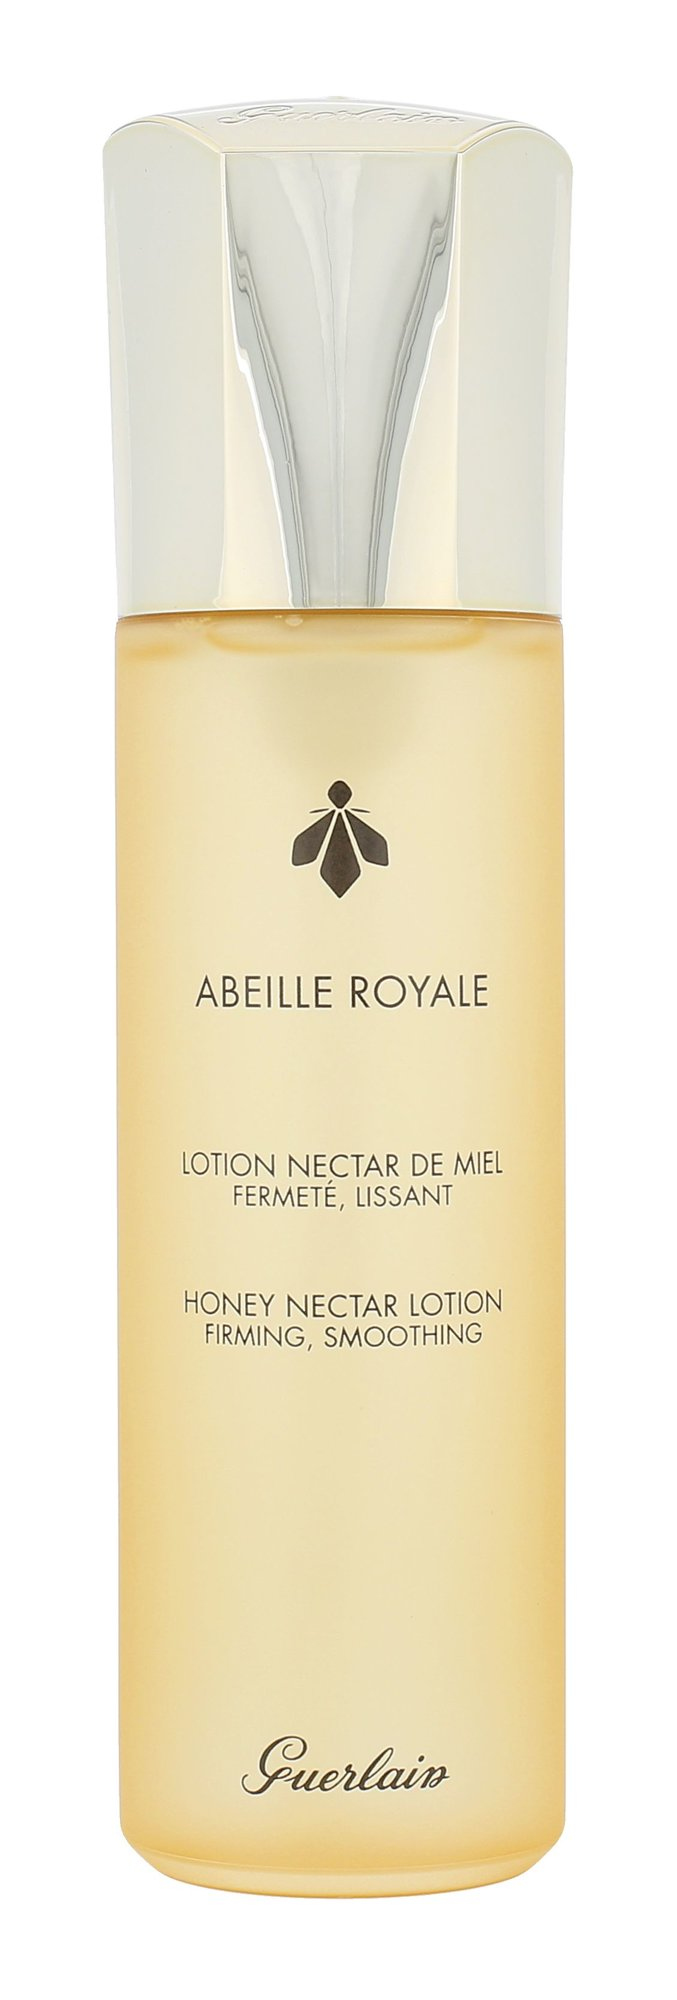 Guerlain Abeille Royale Cosmetic 150ml  Honey Nectar Lotion